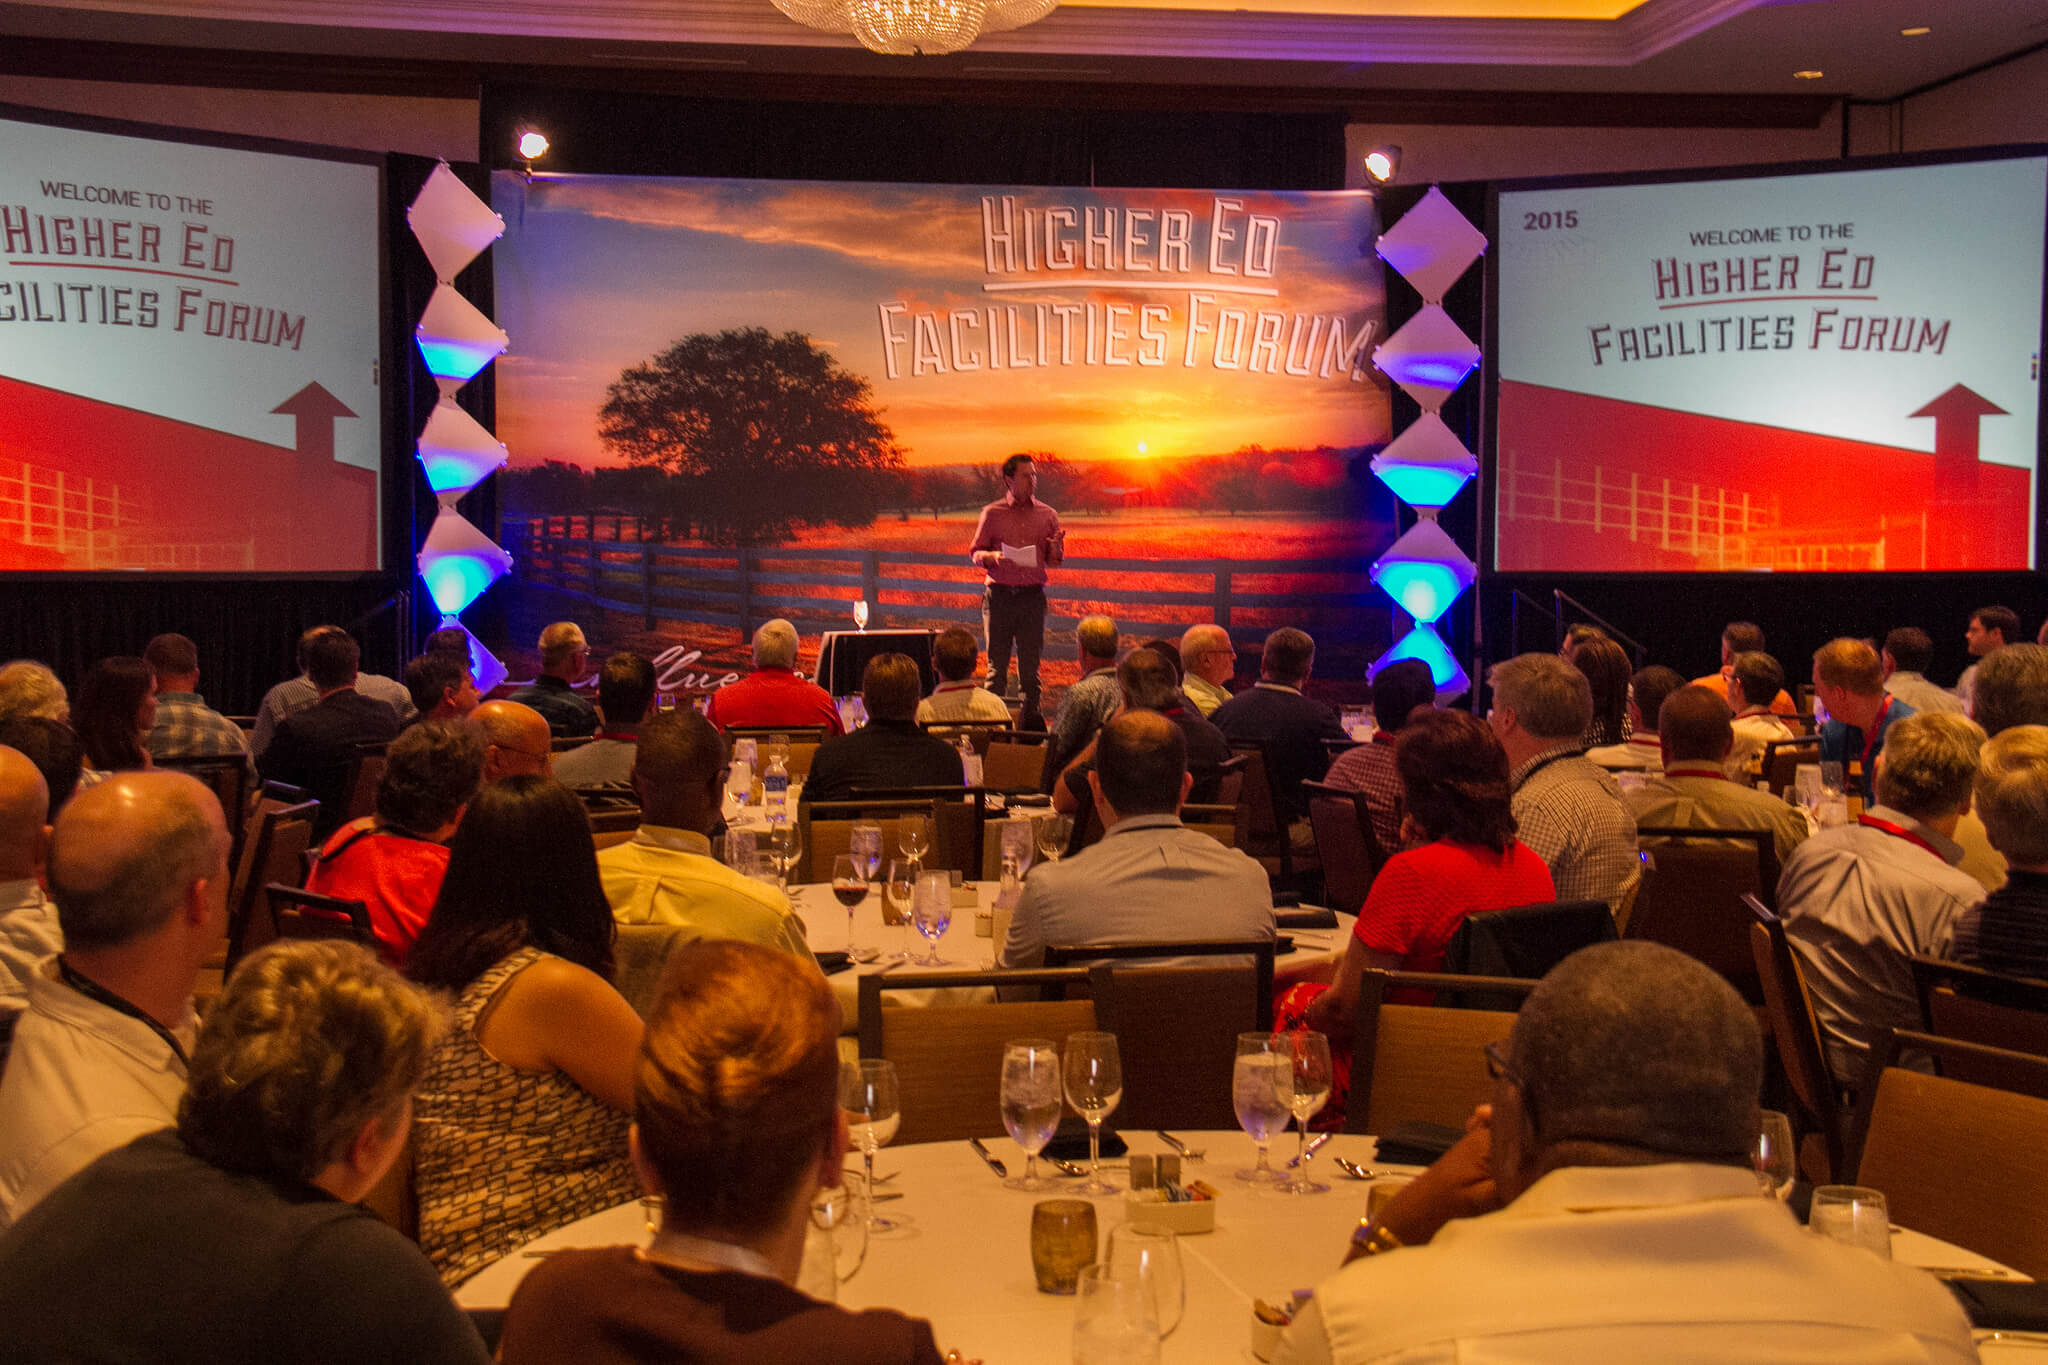 HigherEd-Facilities-Forum.jpg